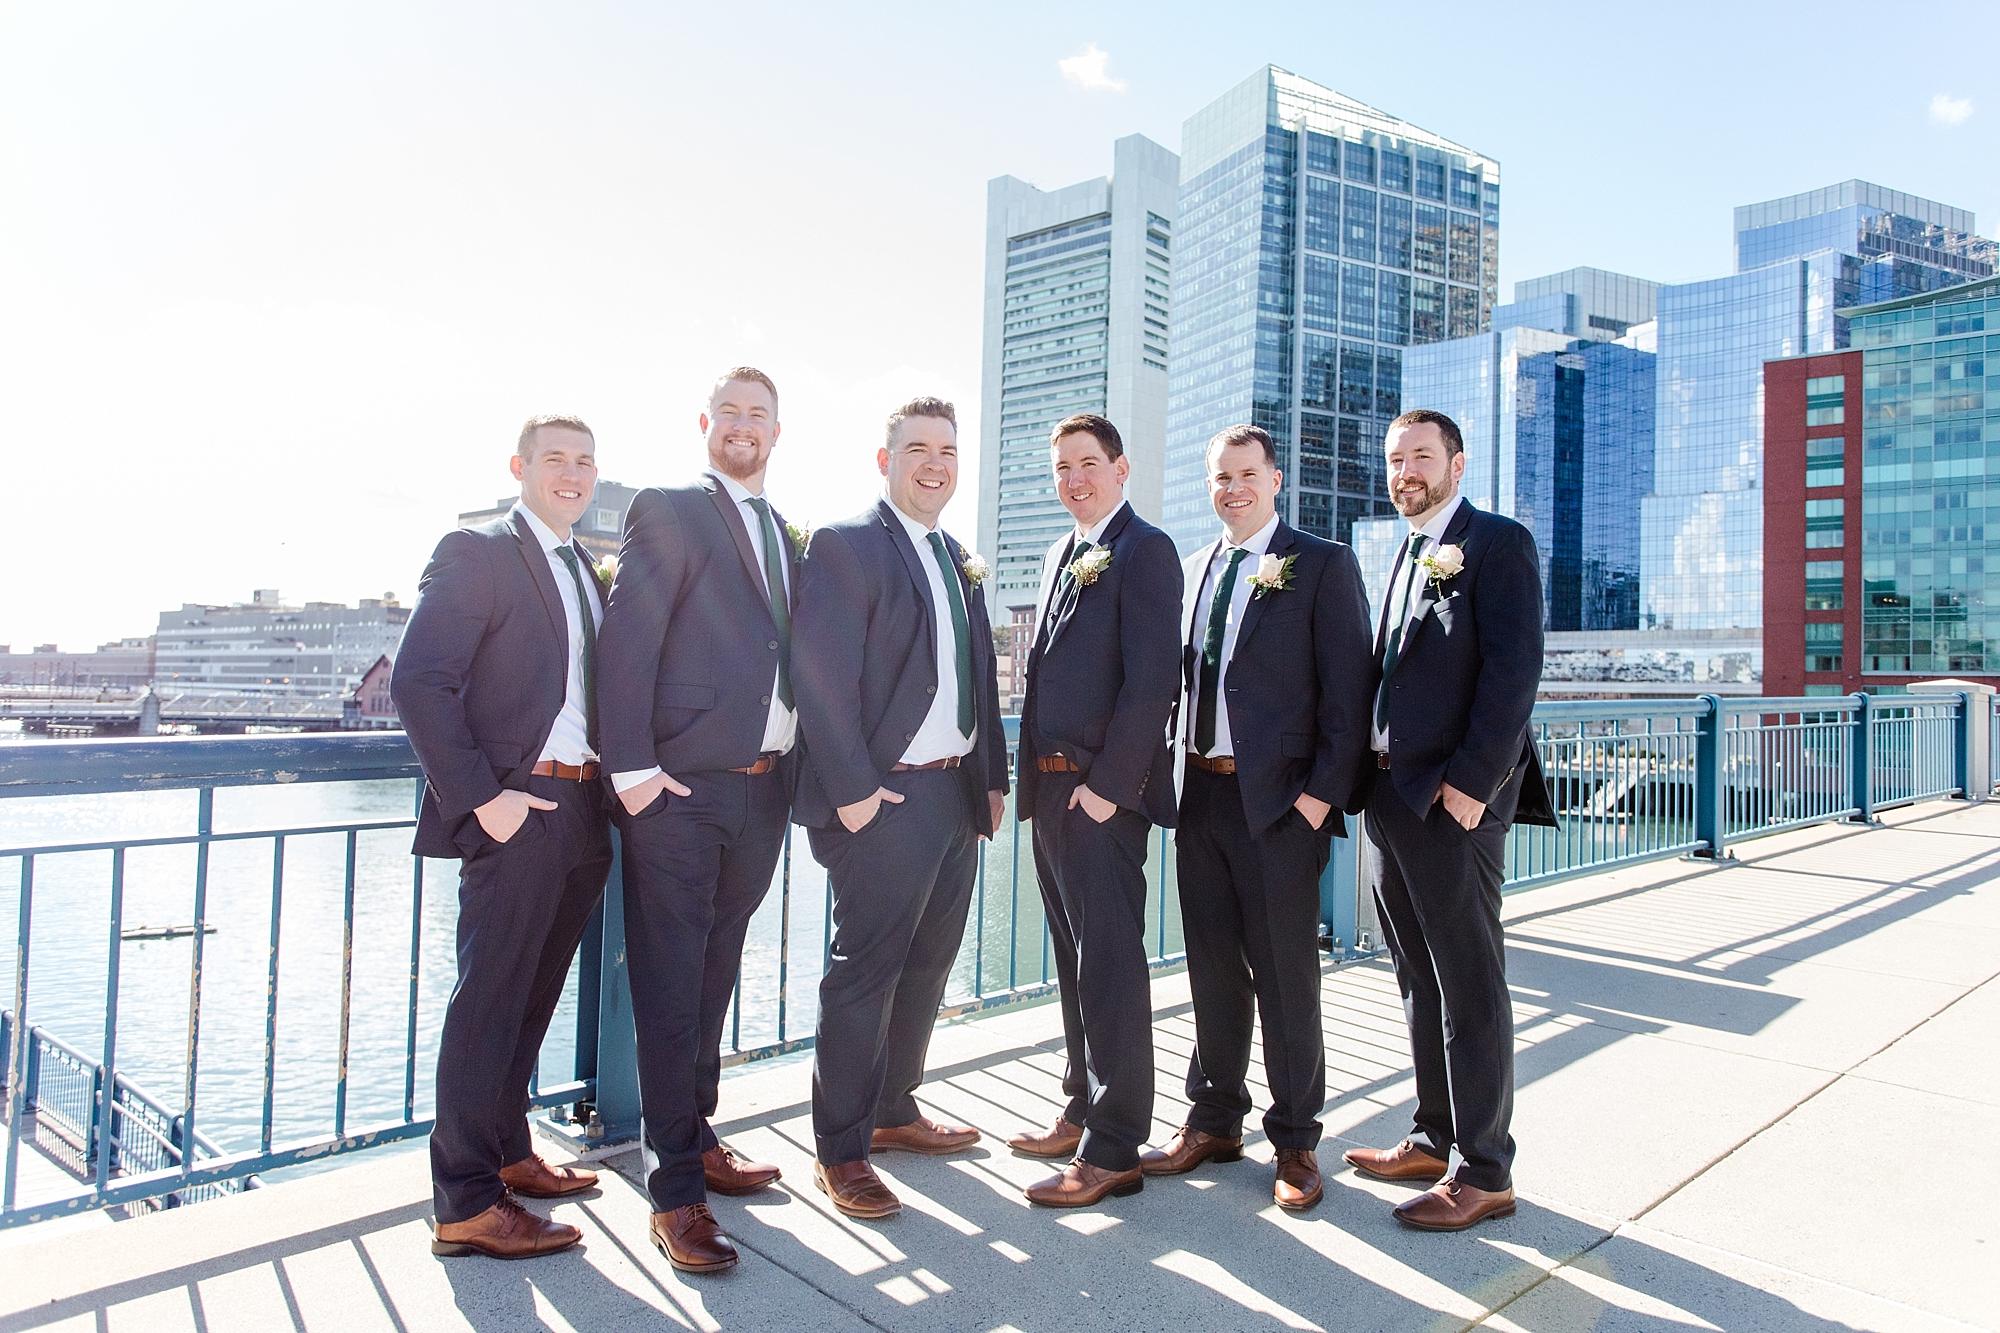 eisleyimages-irish-wedding-boston-seaport_0055.jpg